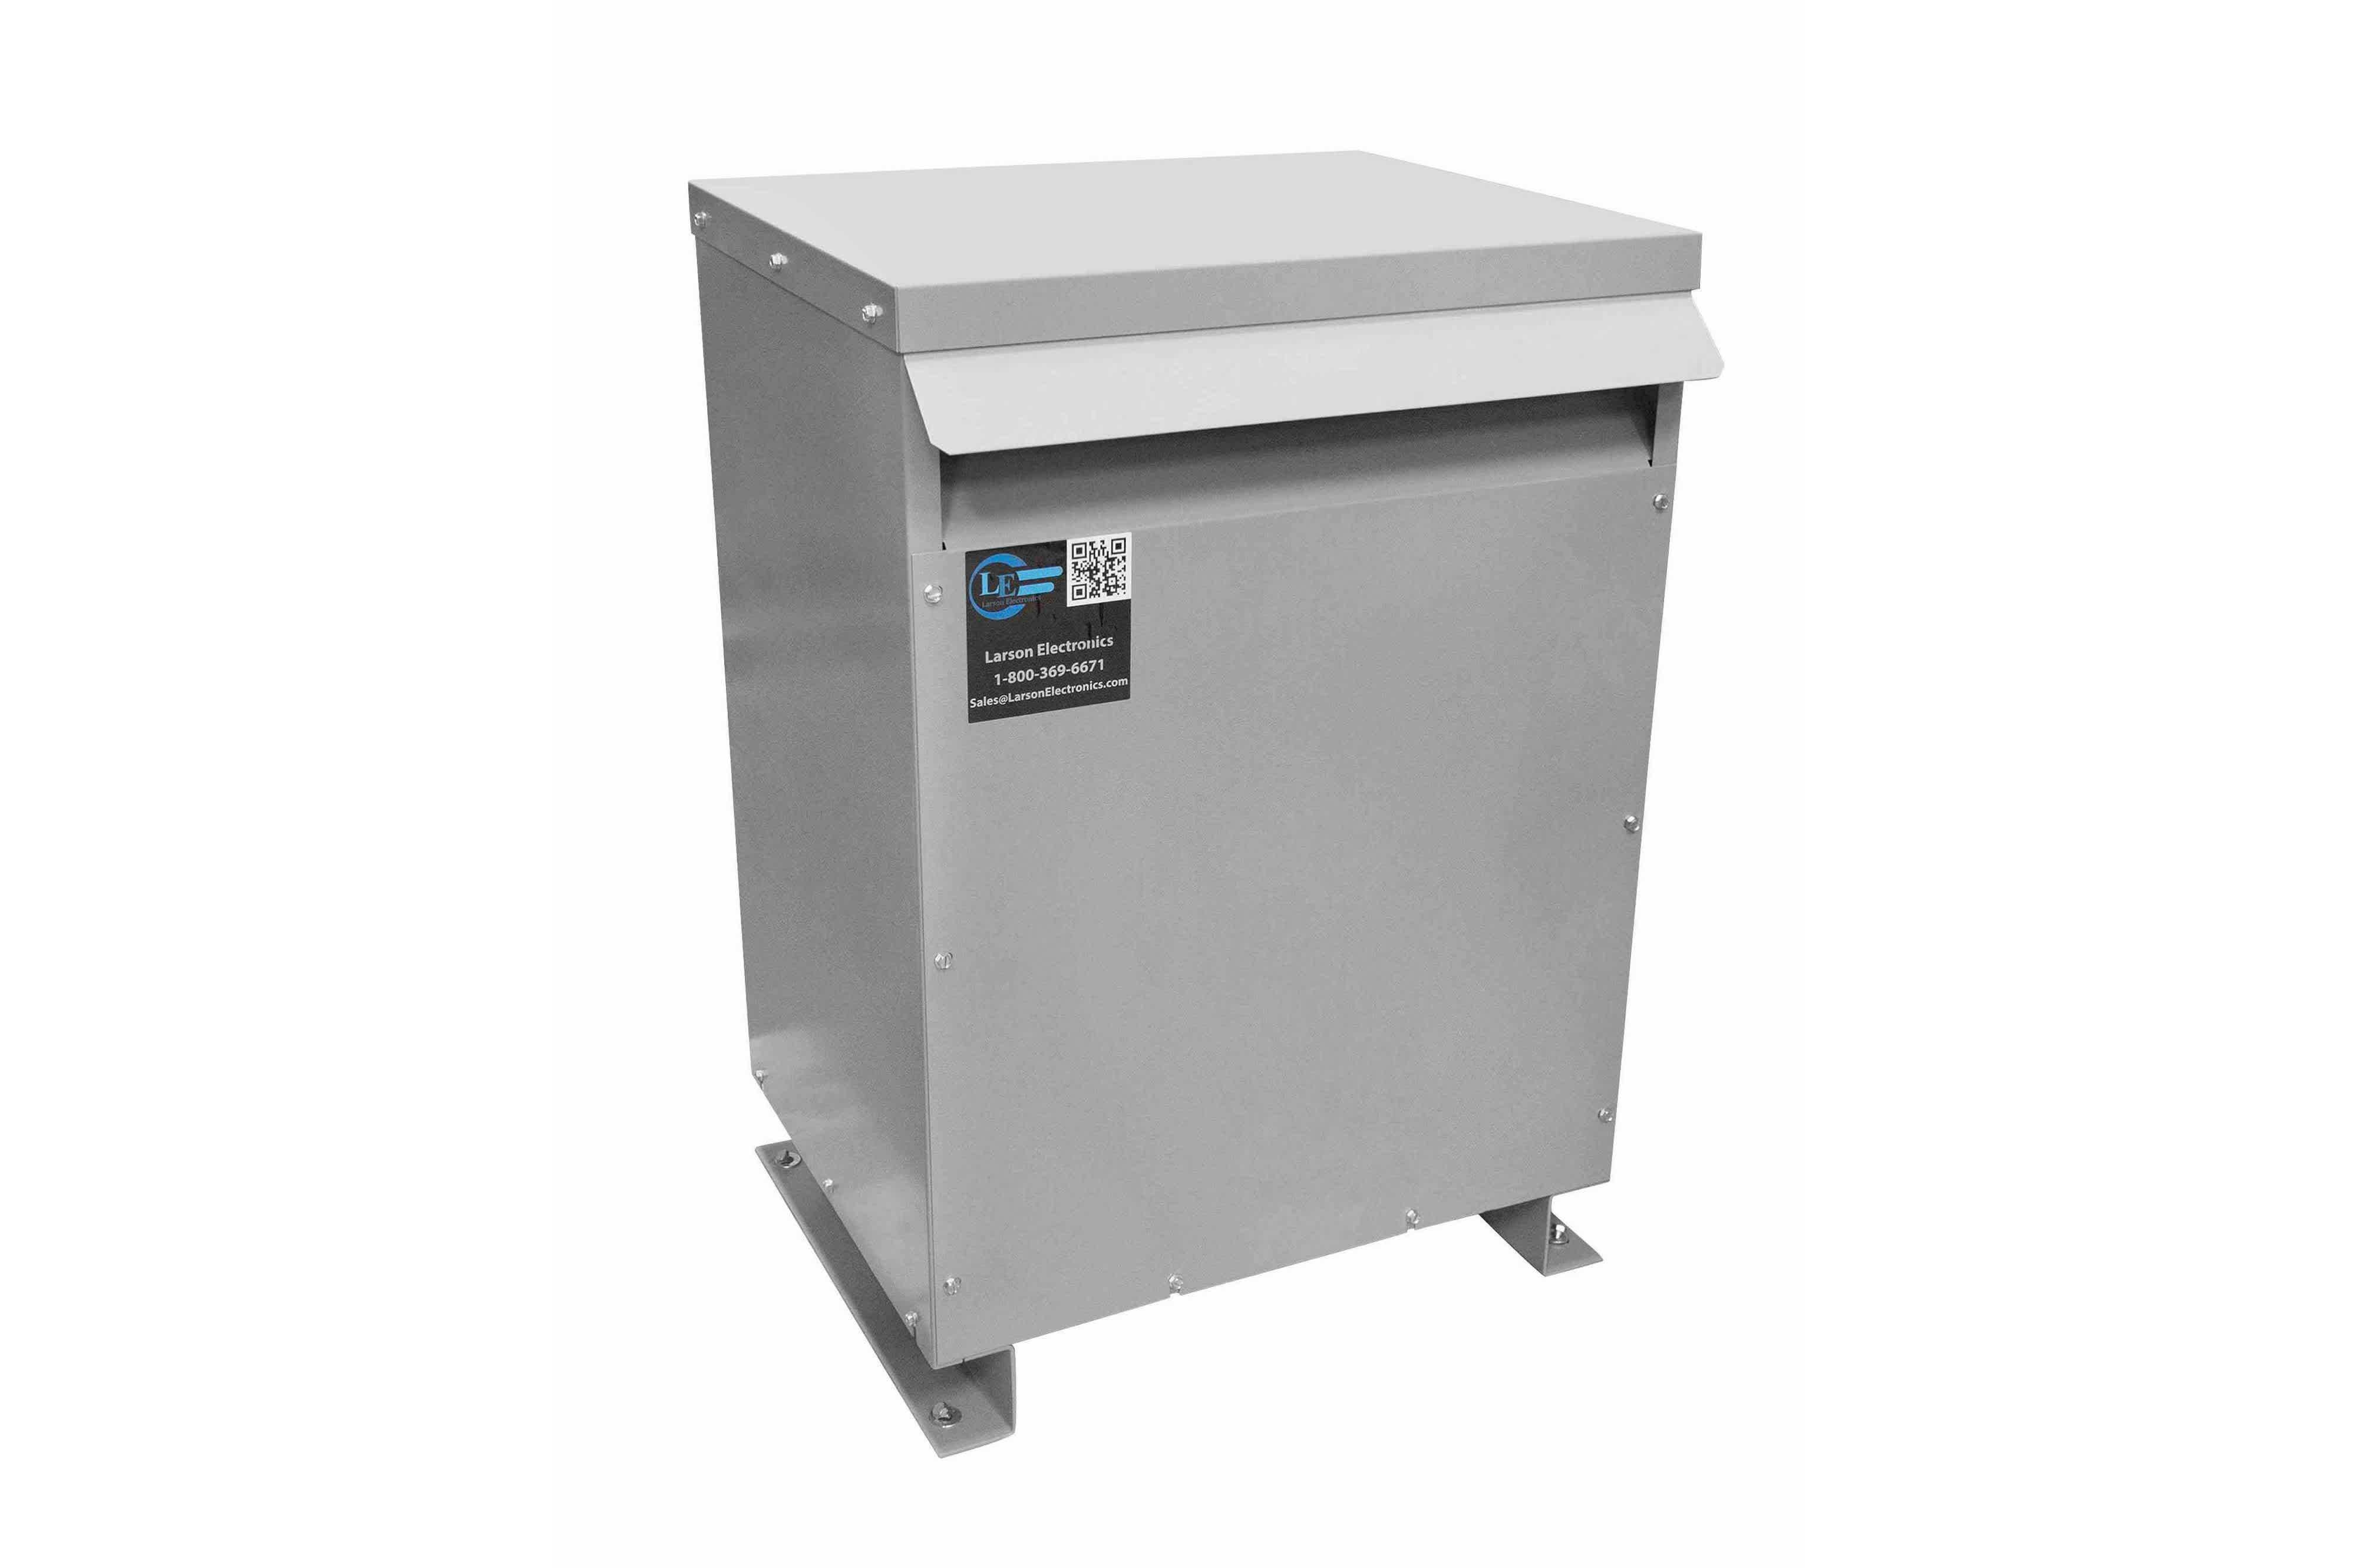 36 kVA 3PH Isolation Transformer, 600V Wye Primary, 240V Delta Secondary, N3R, Ventilated, 60 Hz